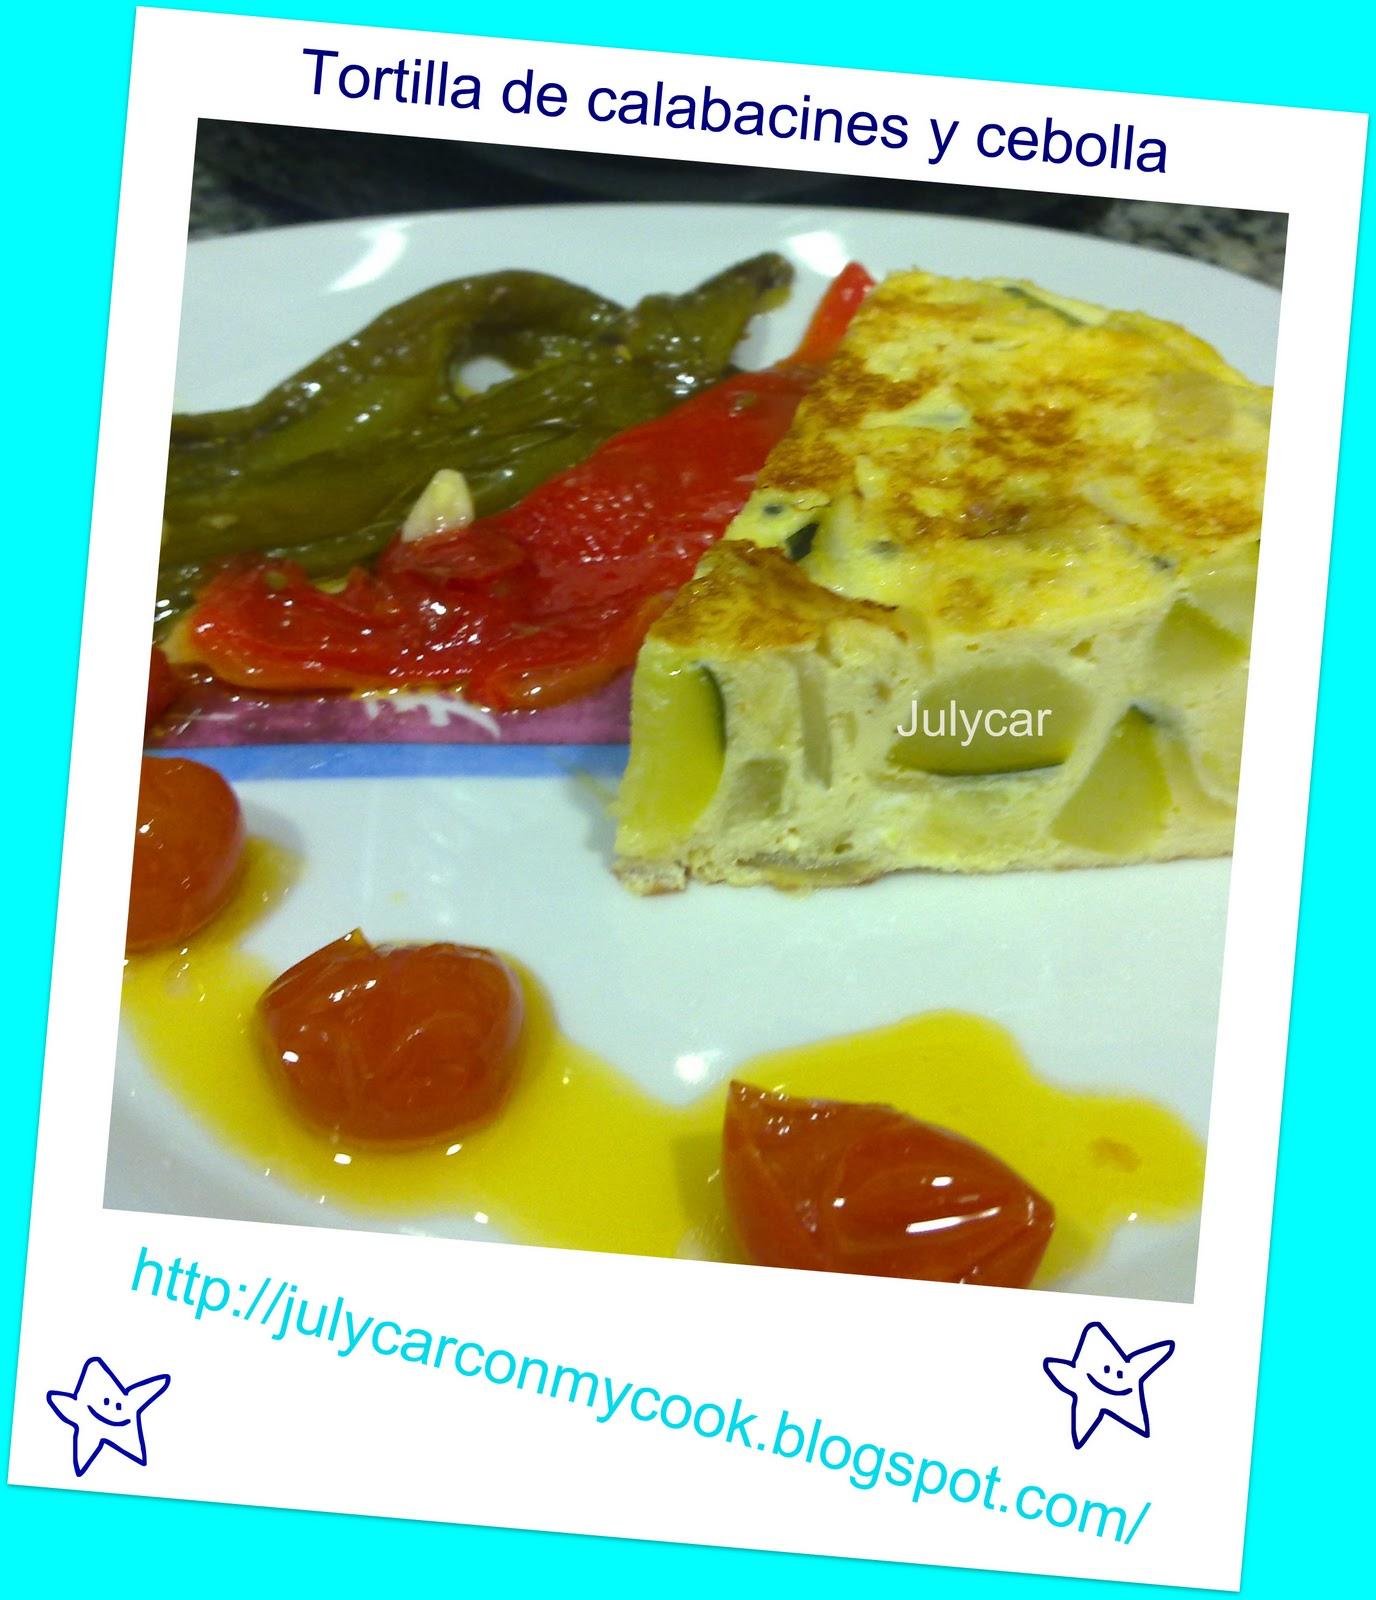 Cocinando con ollas programables gm e gm d cocimix - Tortilla de calabacin y cebolla ...